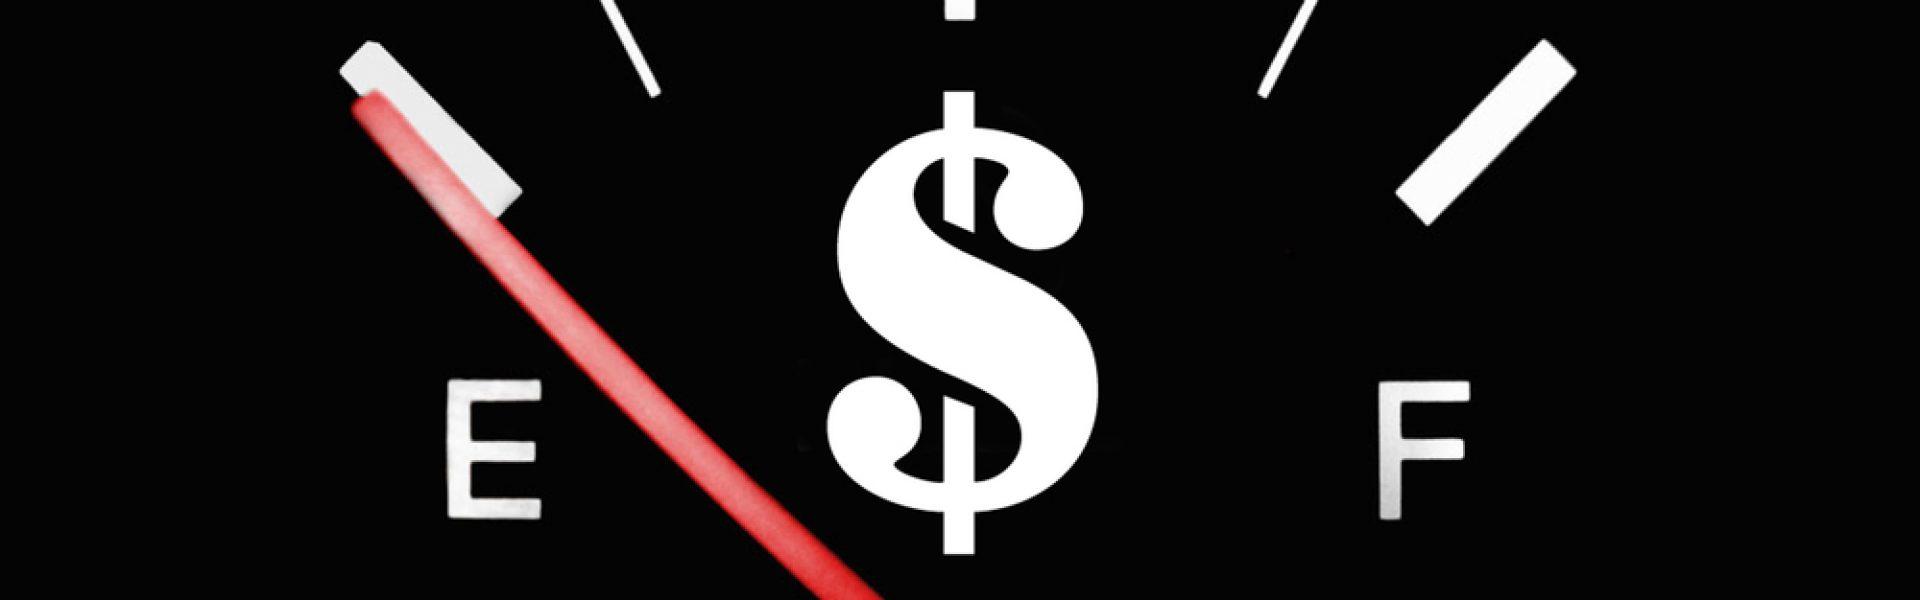 cash flow gage showing empty